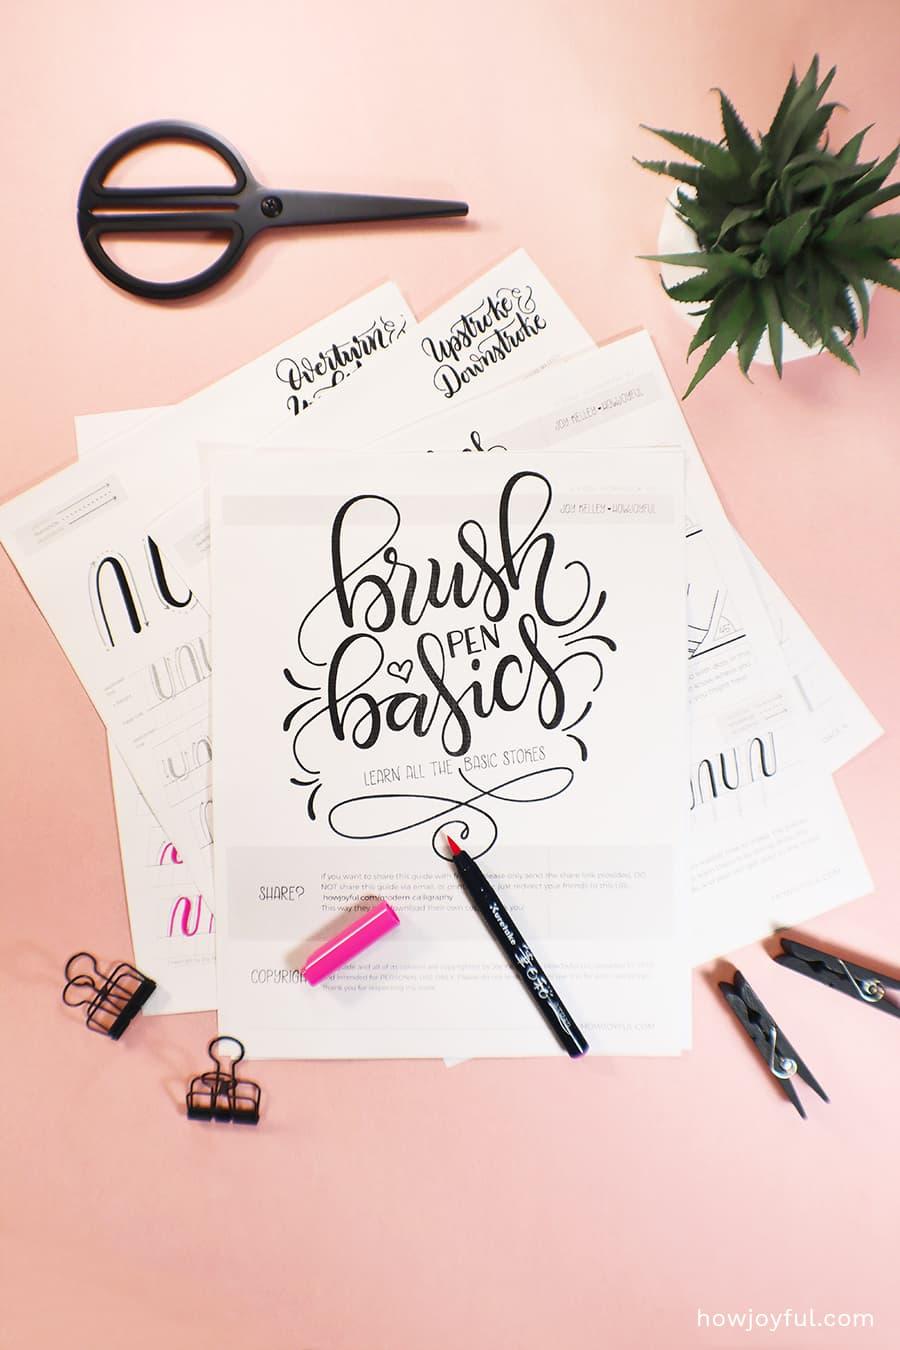 Brush pen basics FREE printable